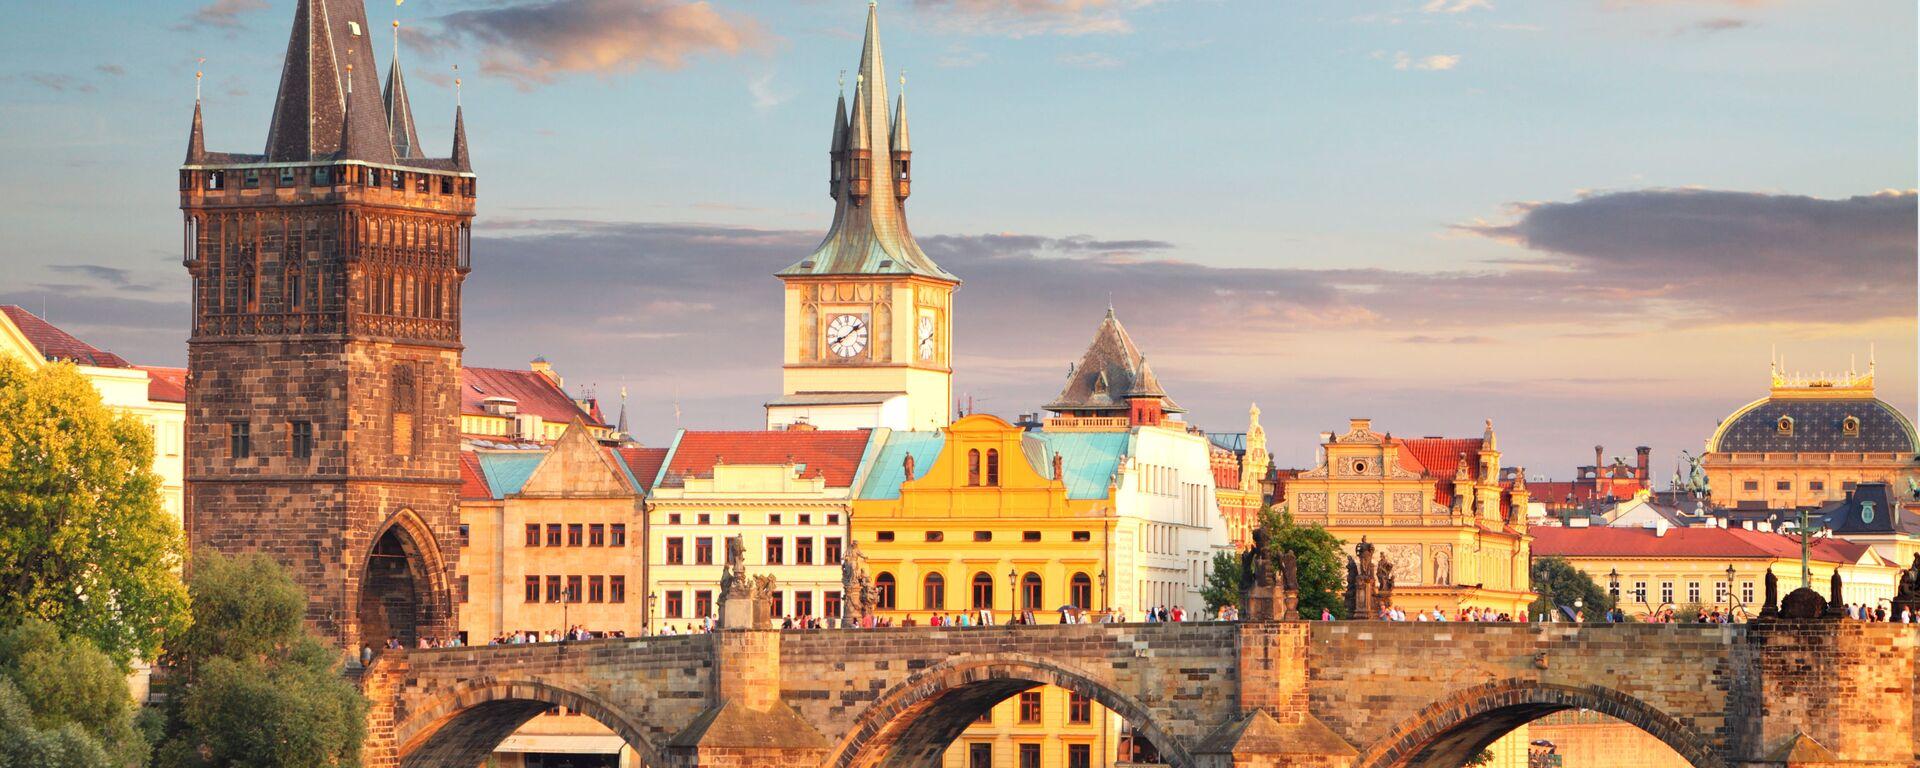 Praha, Karlův most - Sputnik Česká republika, 1920, 12.08.2021